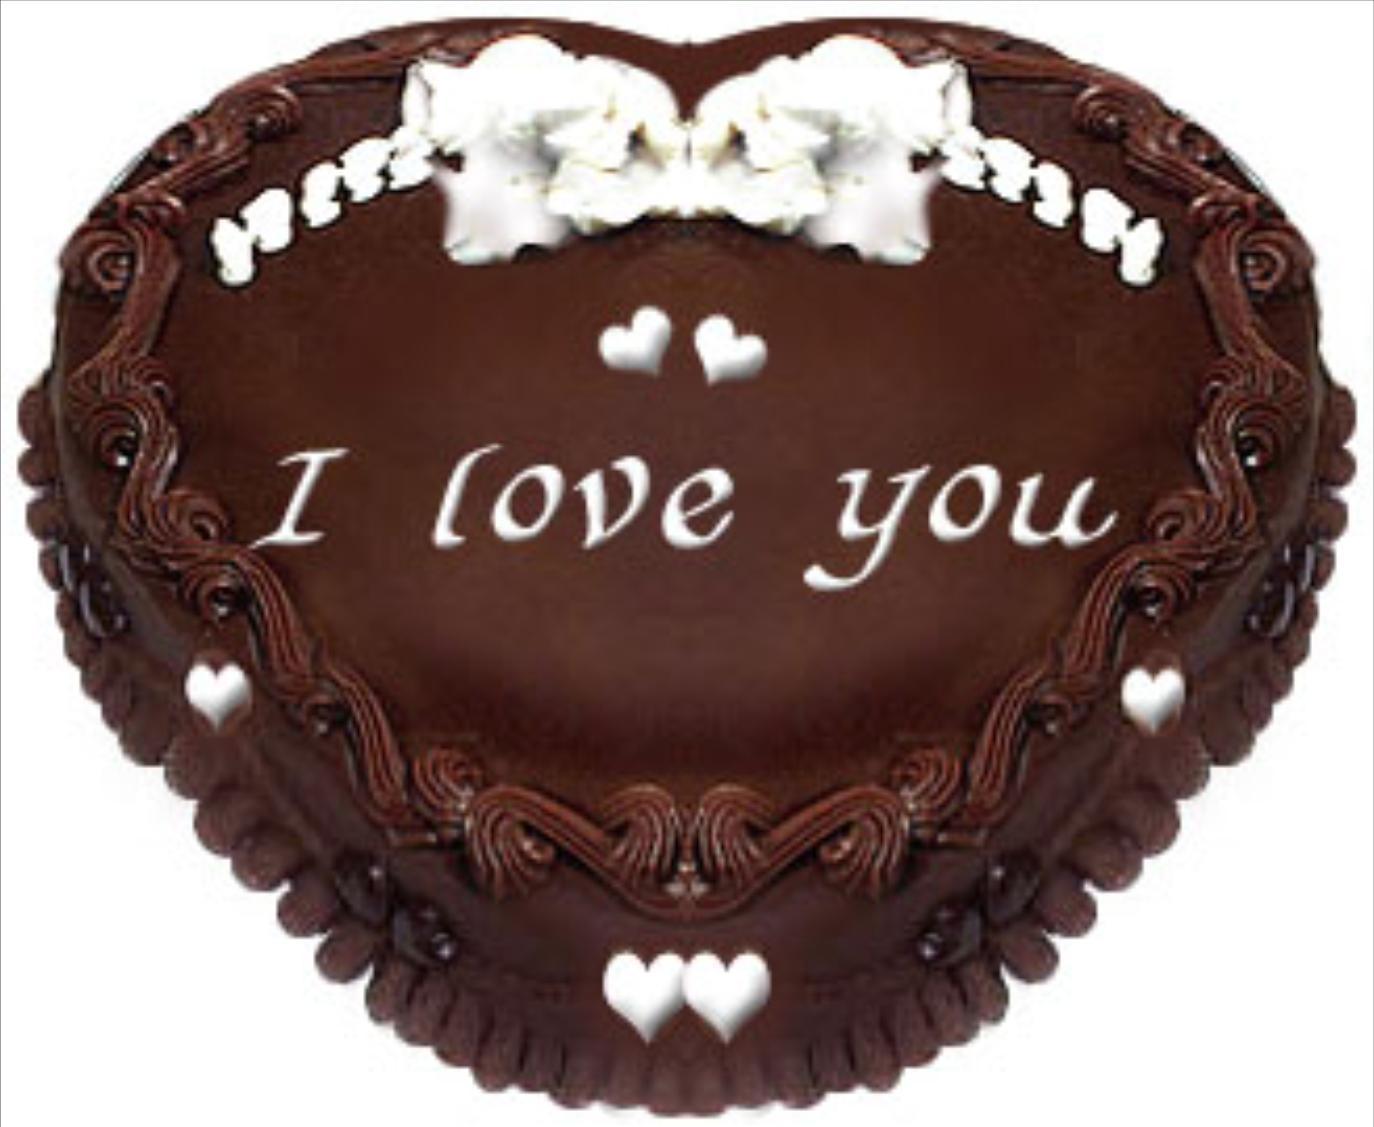 Superbe Gâteau Coeur Au Chocolat I Love You